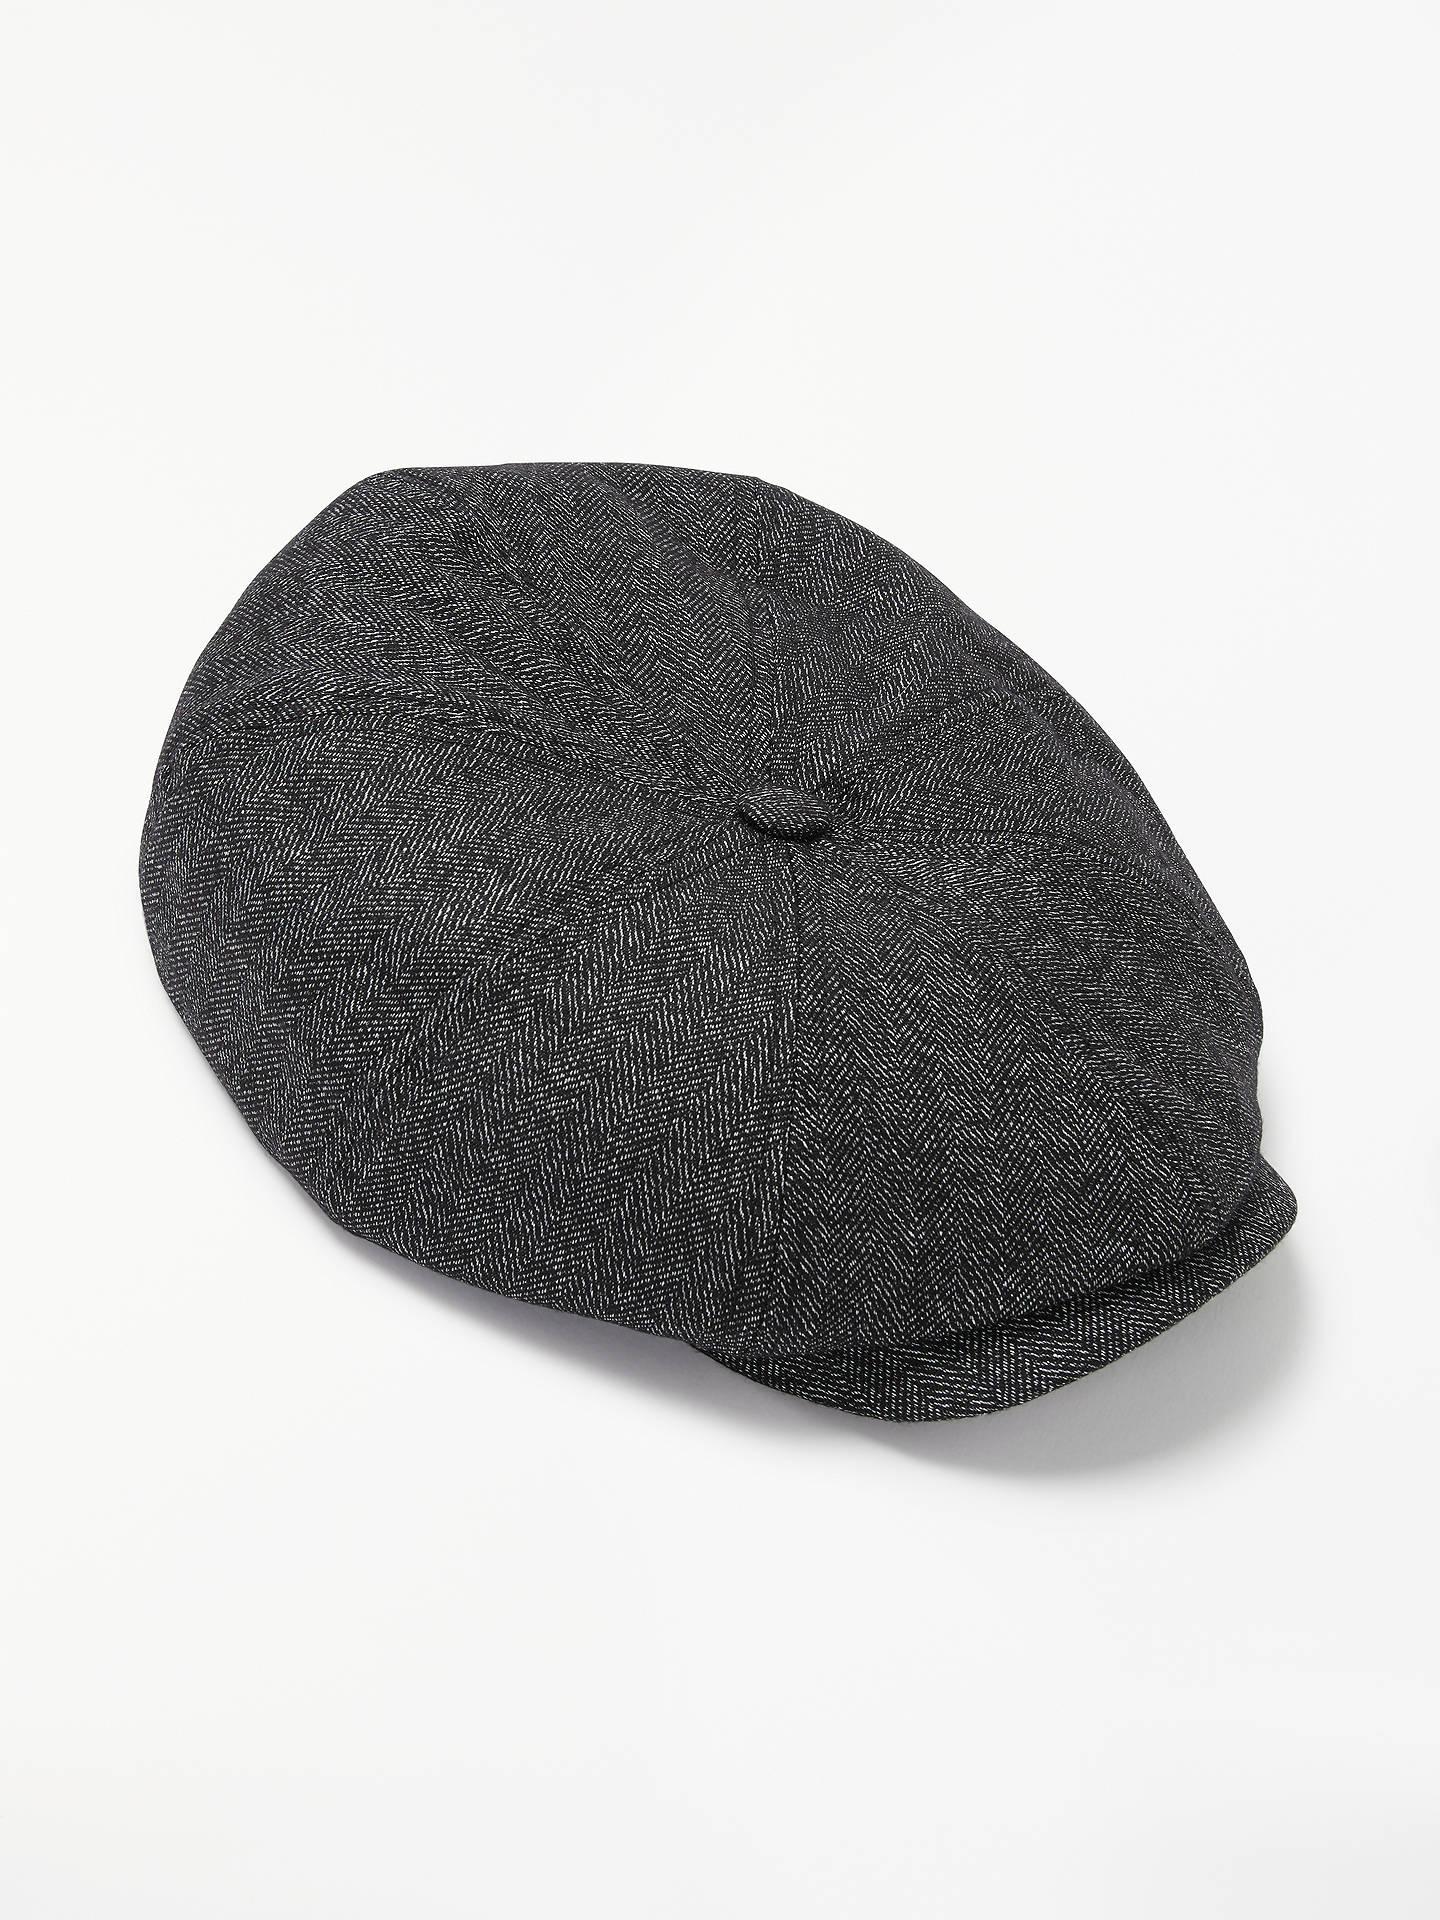 0c572b349879 ... Buy Ted Baker Herringbone Baker Boy Hat